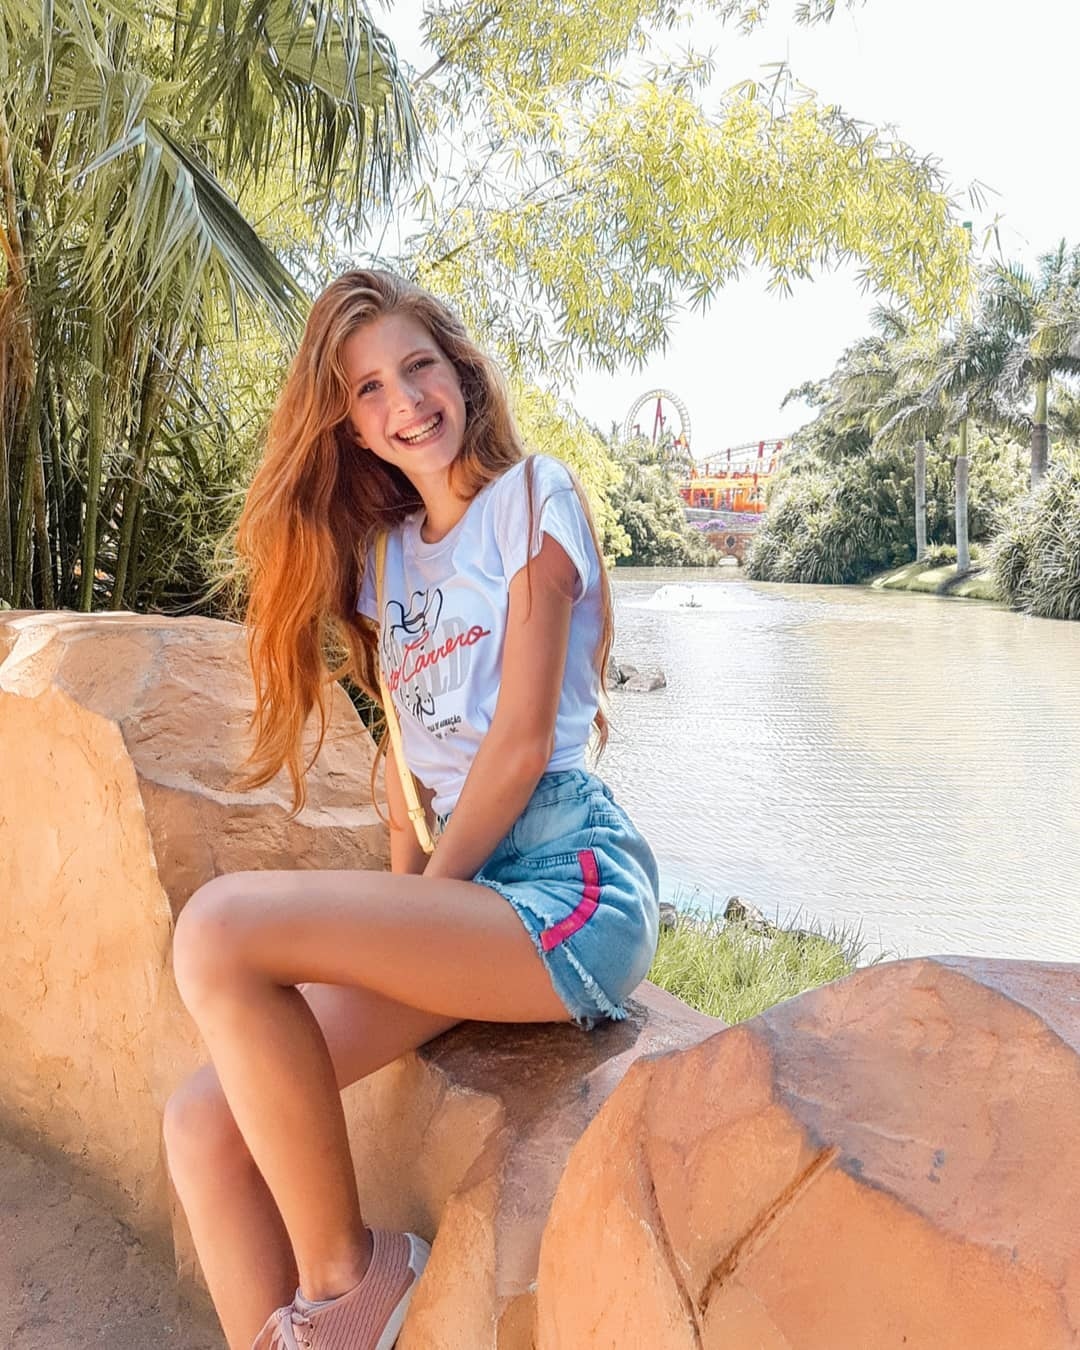 Julia-Vitoria-Mayer-Wallpapers-Insta-Fit-Bio-9